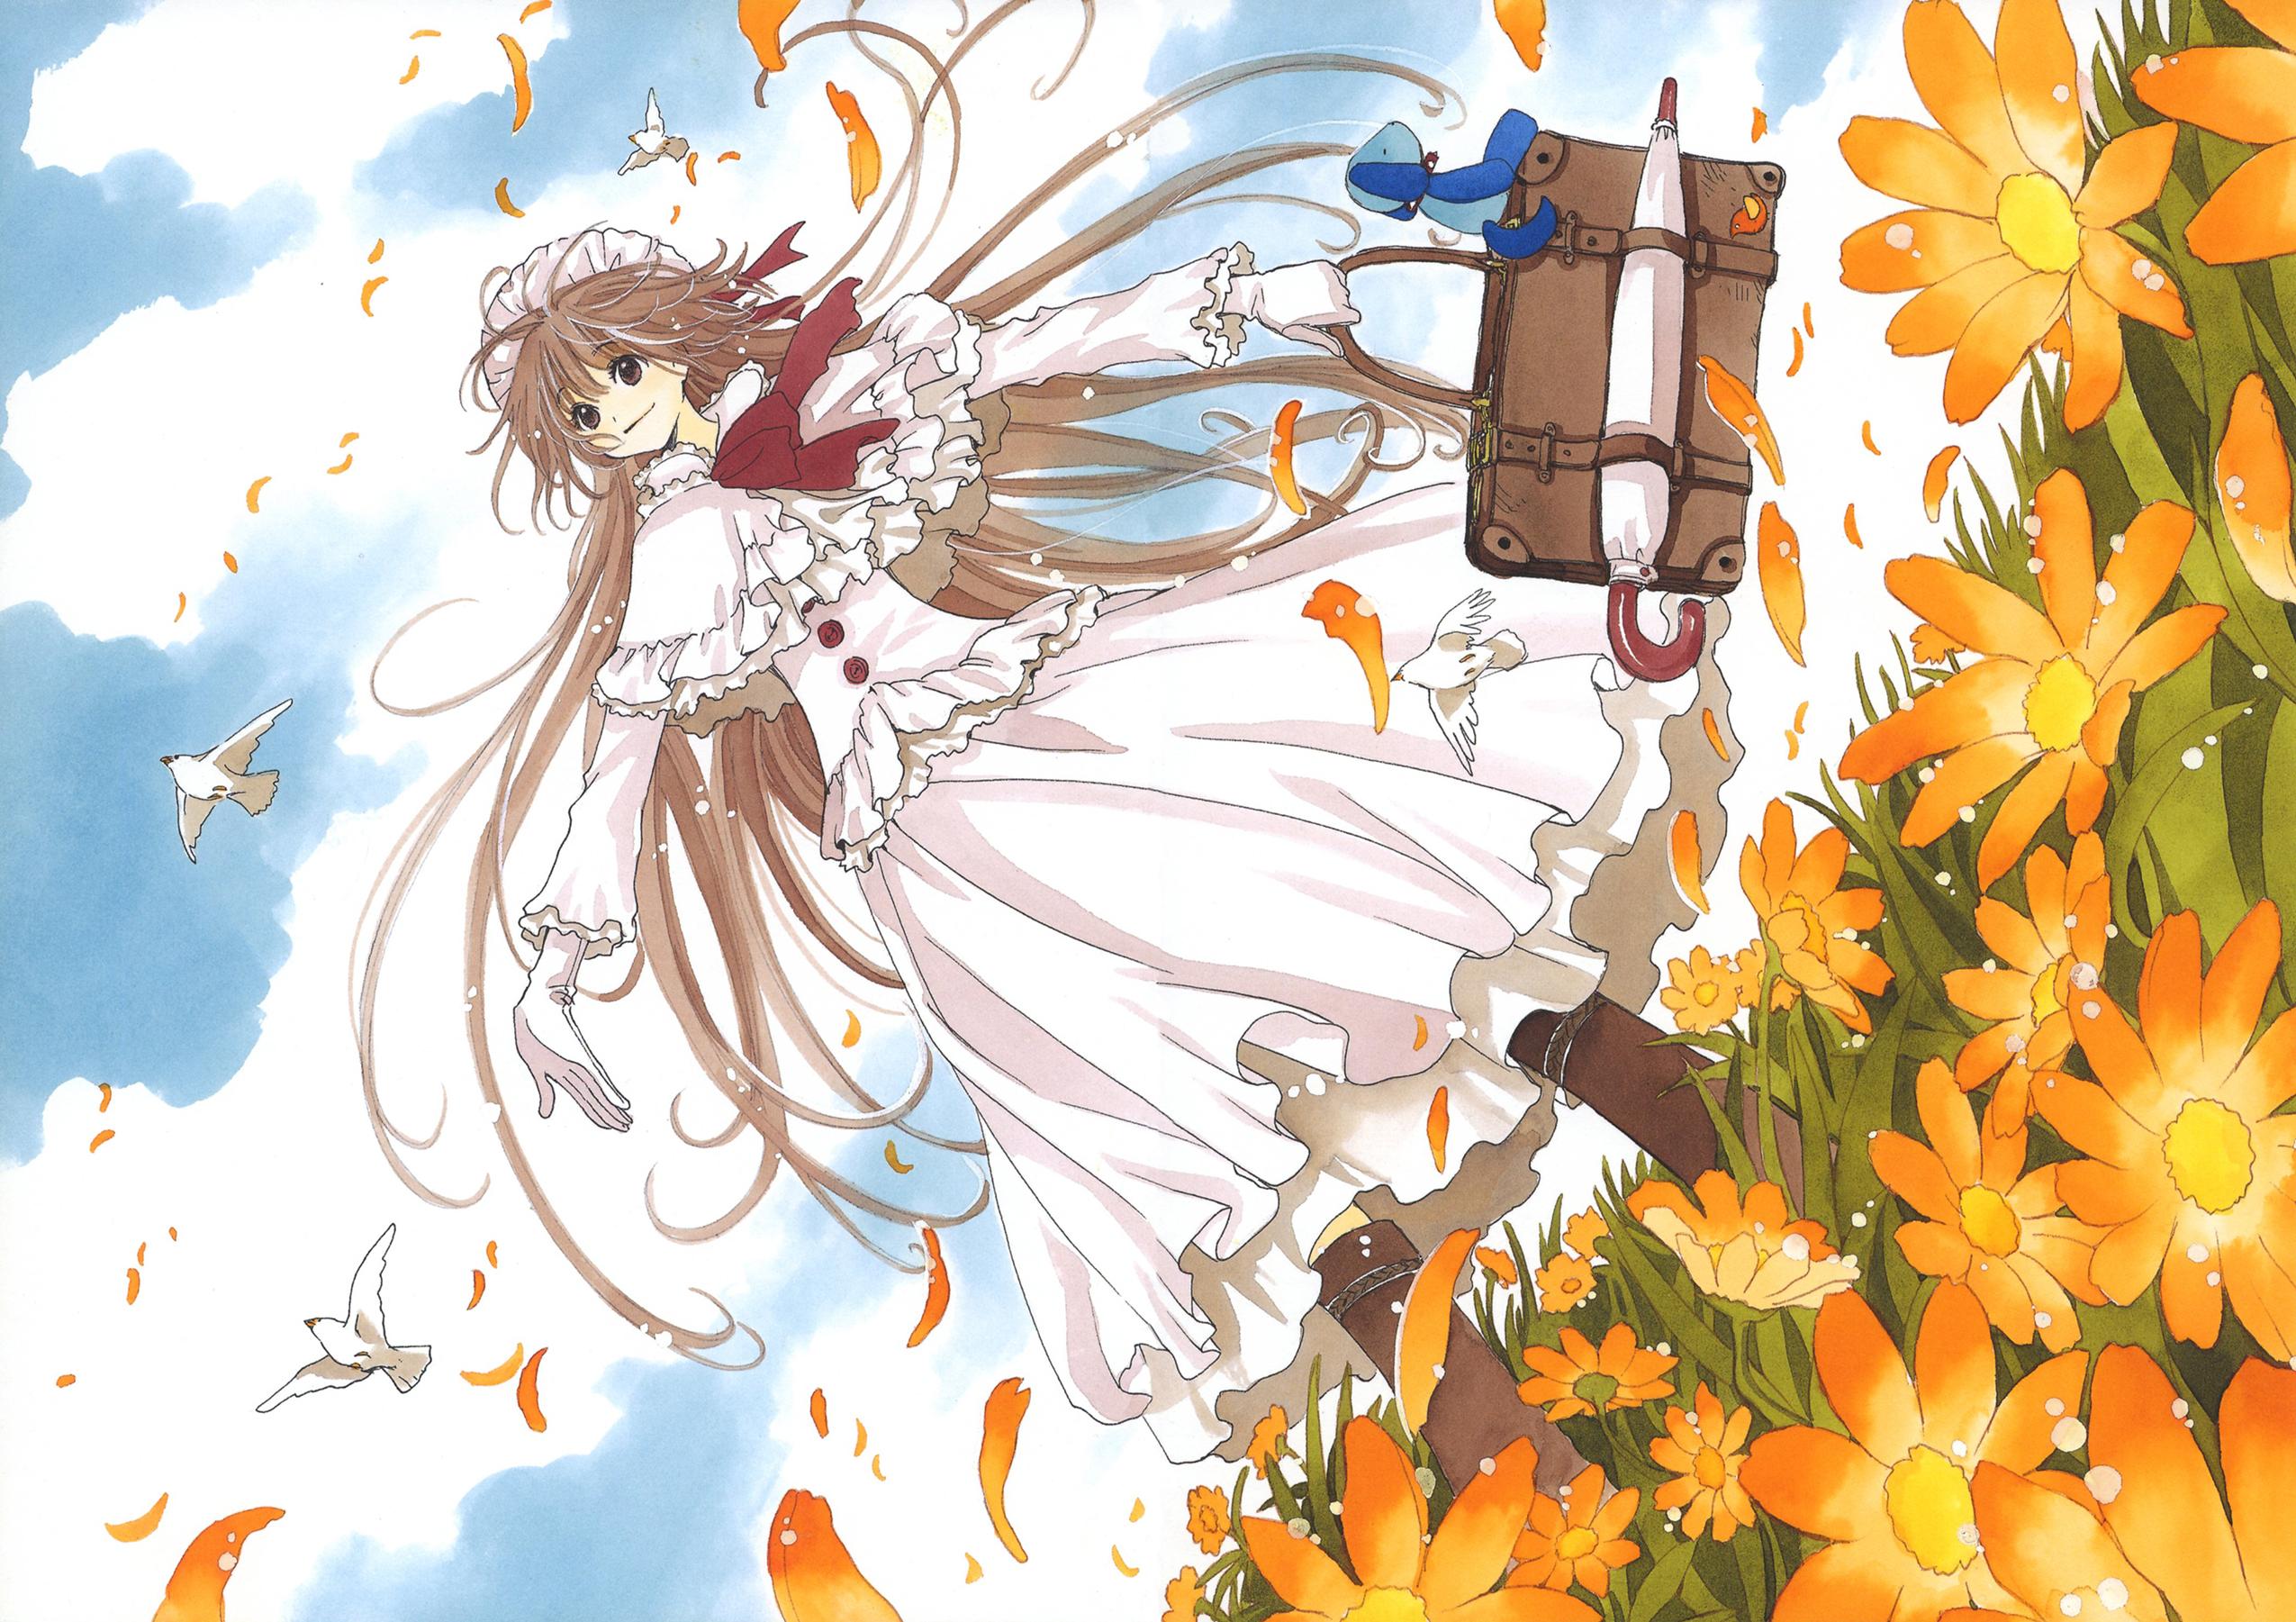 Anime 2550x1801 CLAMP Kobato Hanato Kobato anime girls